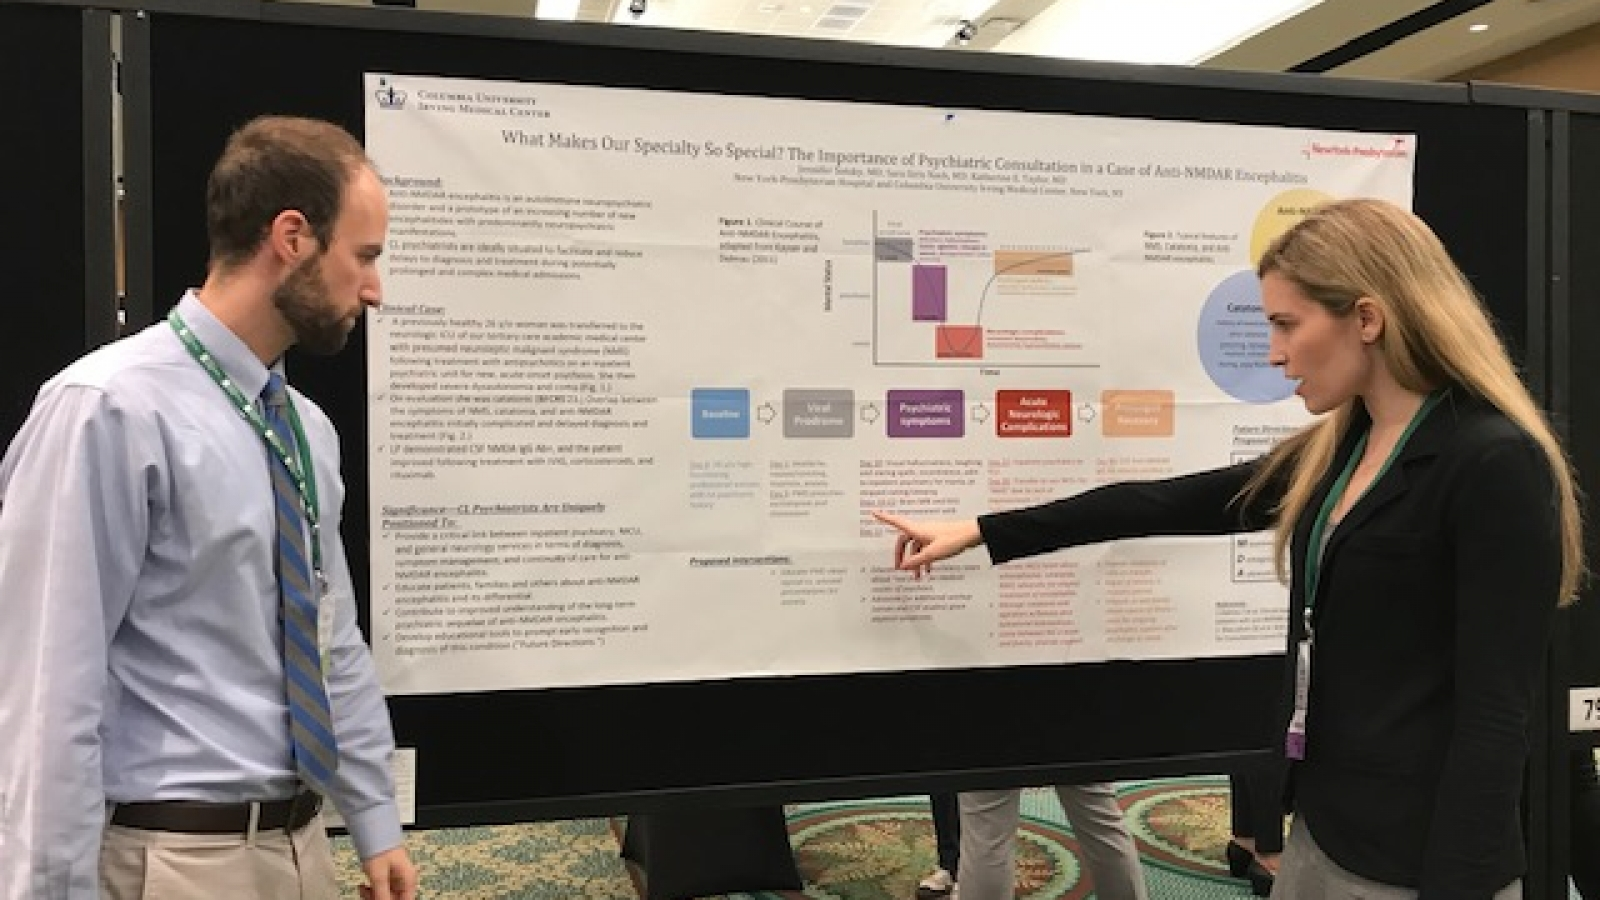 Consultation-Liaison Psychiatry Fellowship | Columbia University